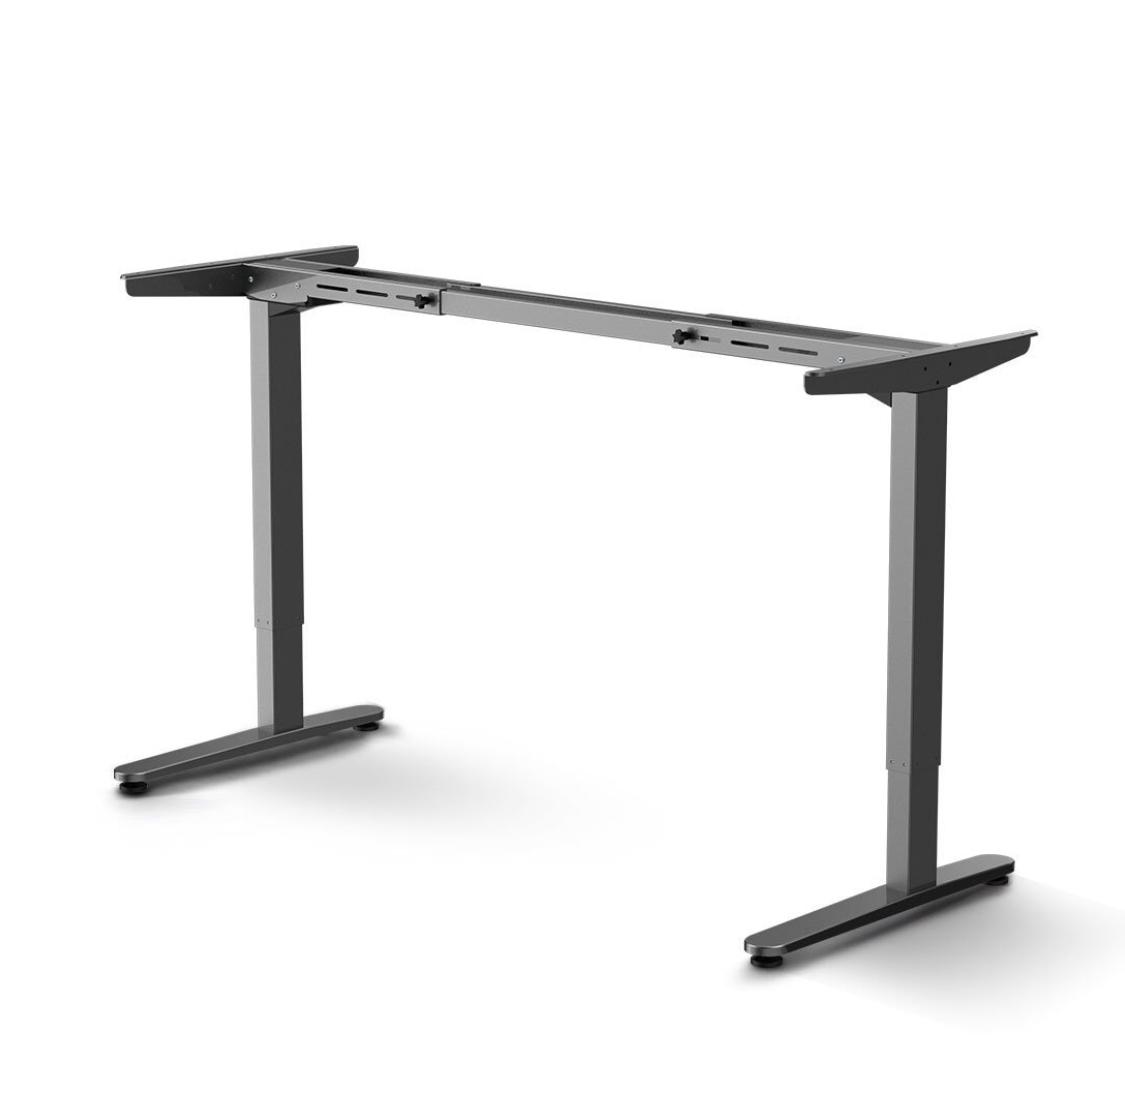 "48"" Electric Height Adjustable Standing Desk Frame $298.99"